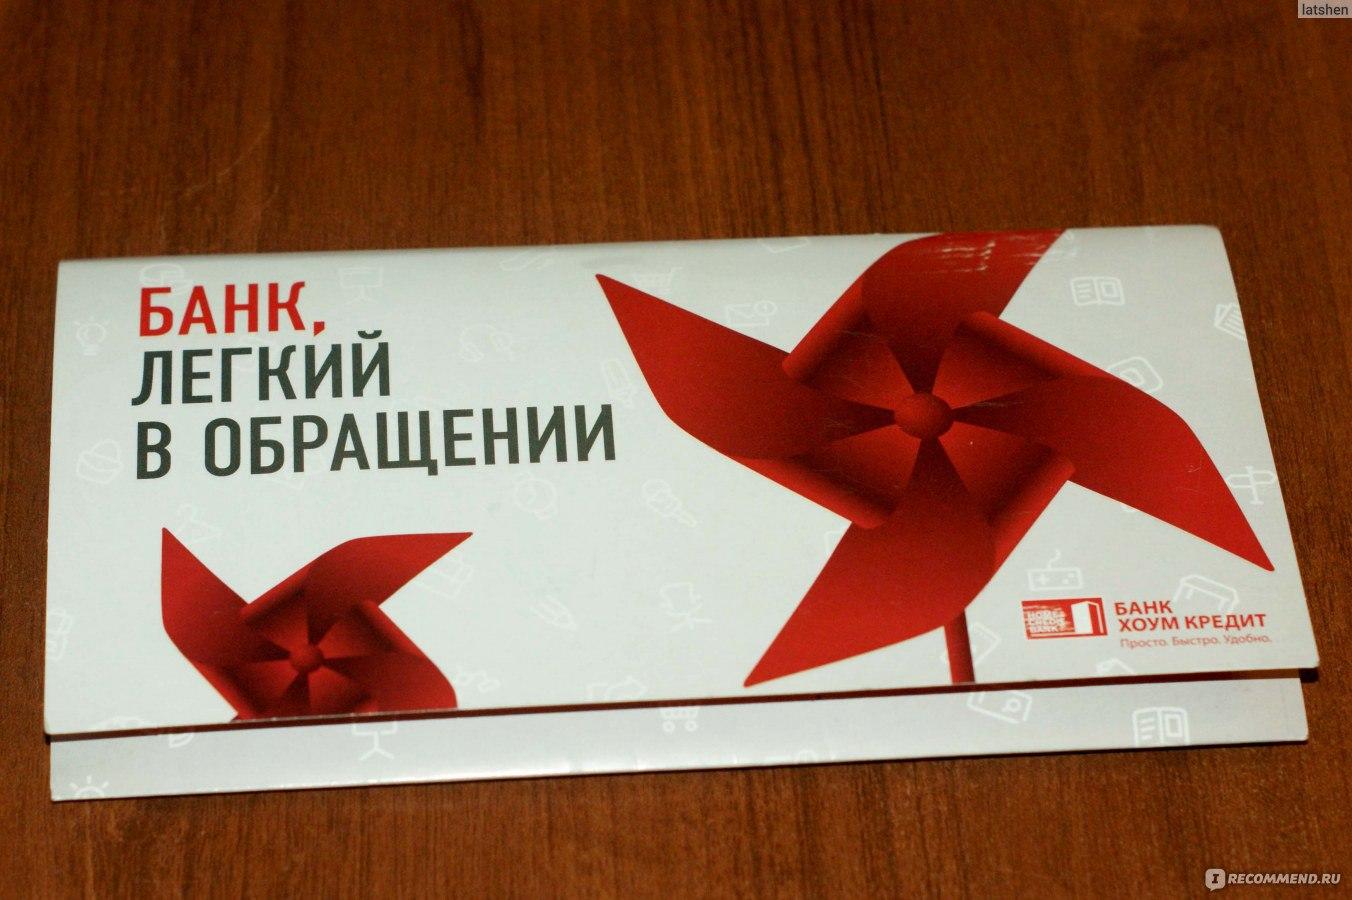 займ у частного лица без залога нотариально в иркутске 2000000 рублей